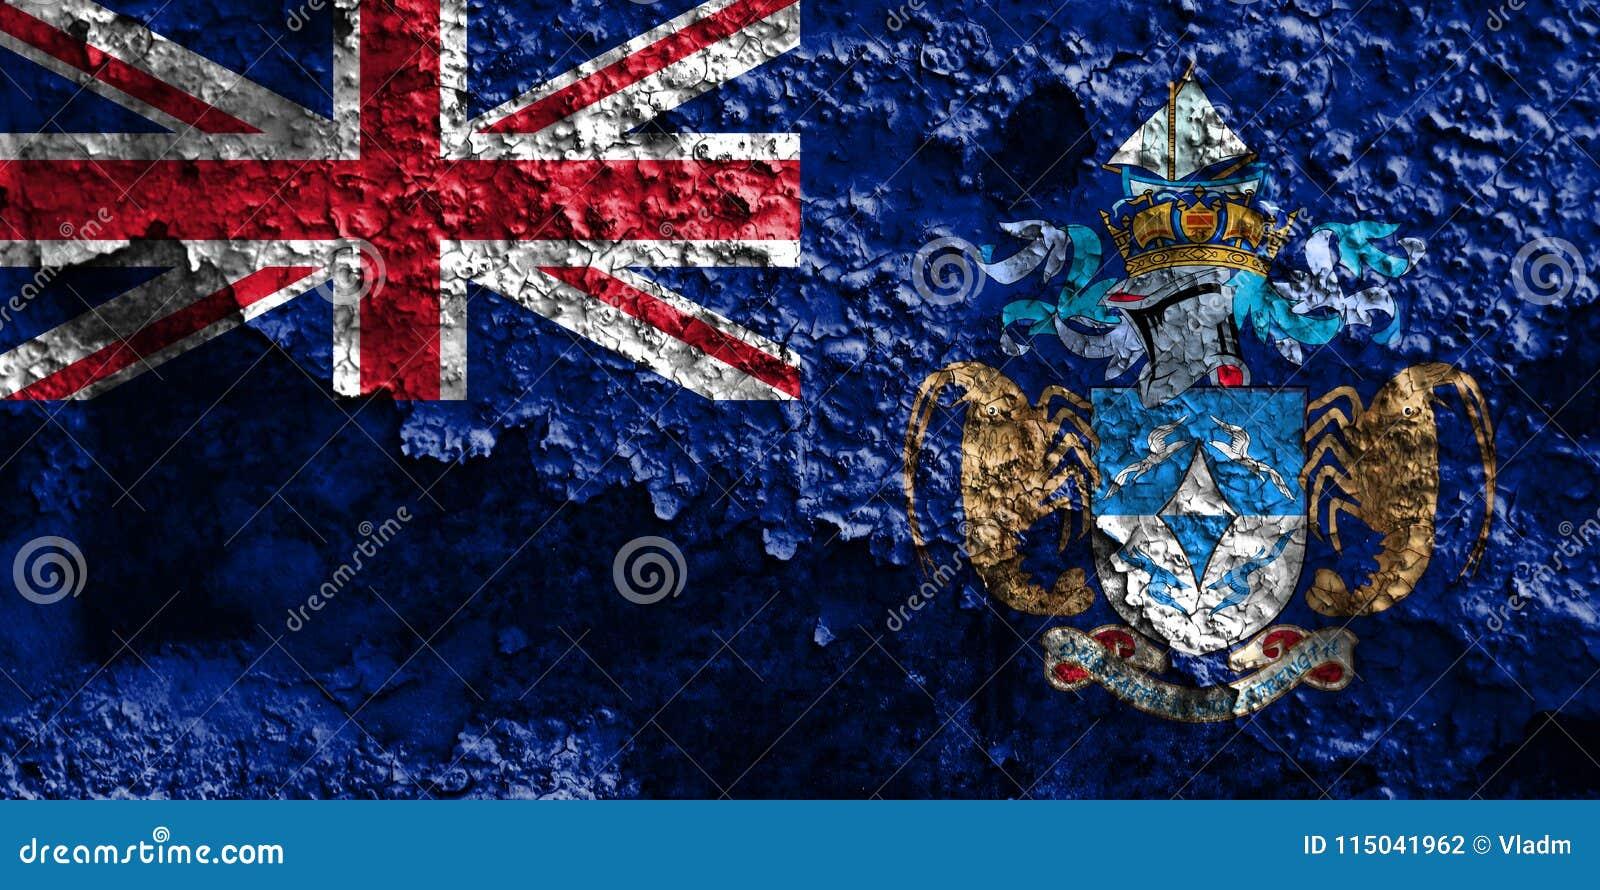 Tristan da Cunha grungeflagga, brittiska utländska territorier, britt